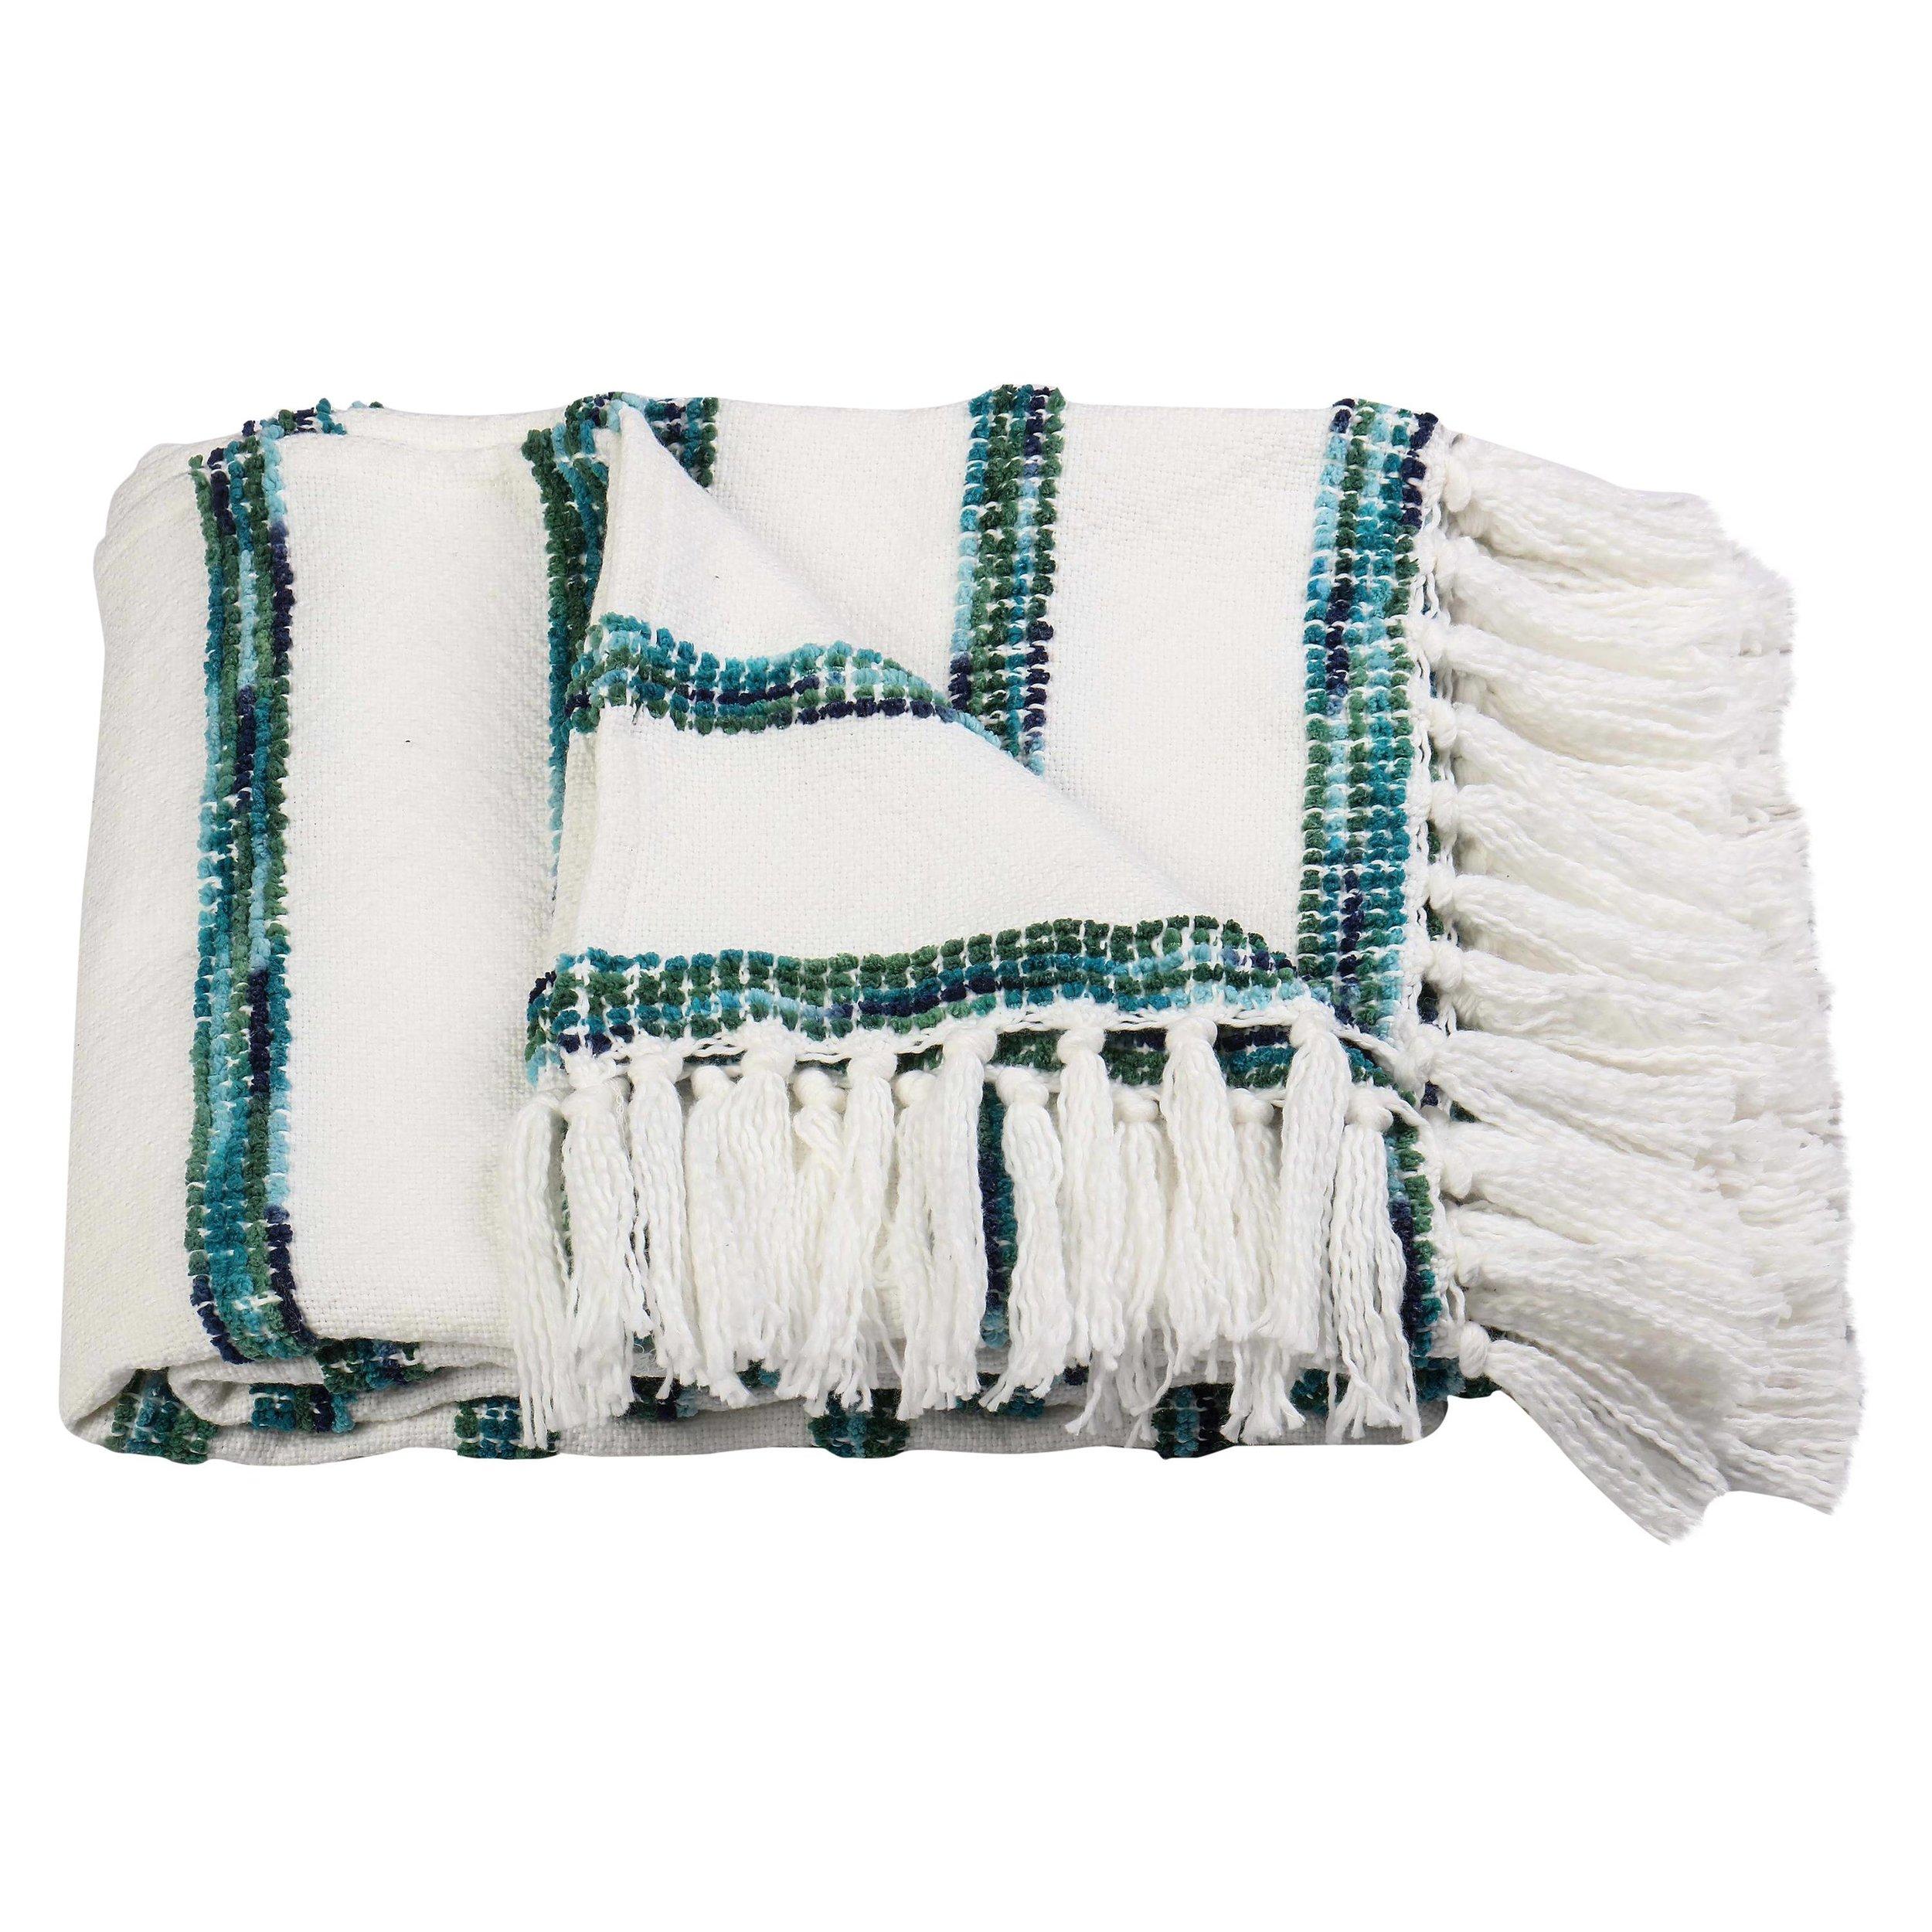 Striped Throw Blanket - White/Blue - Threshold™